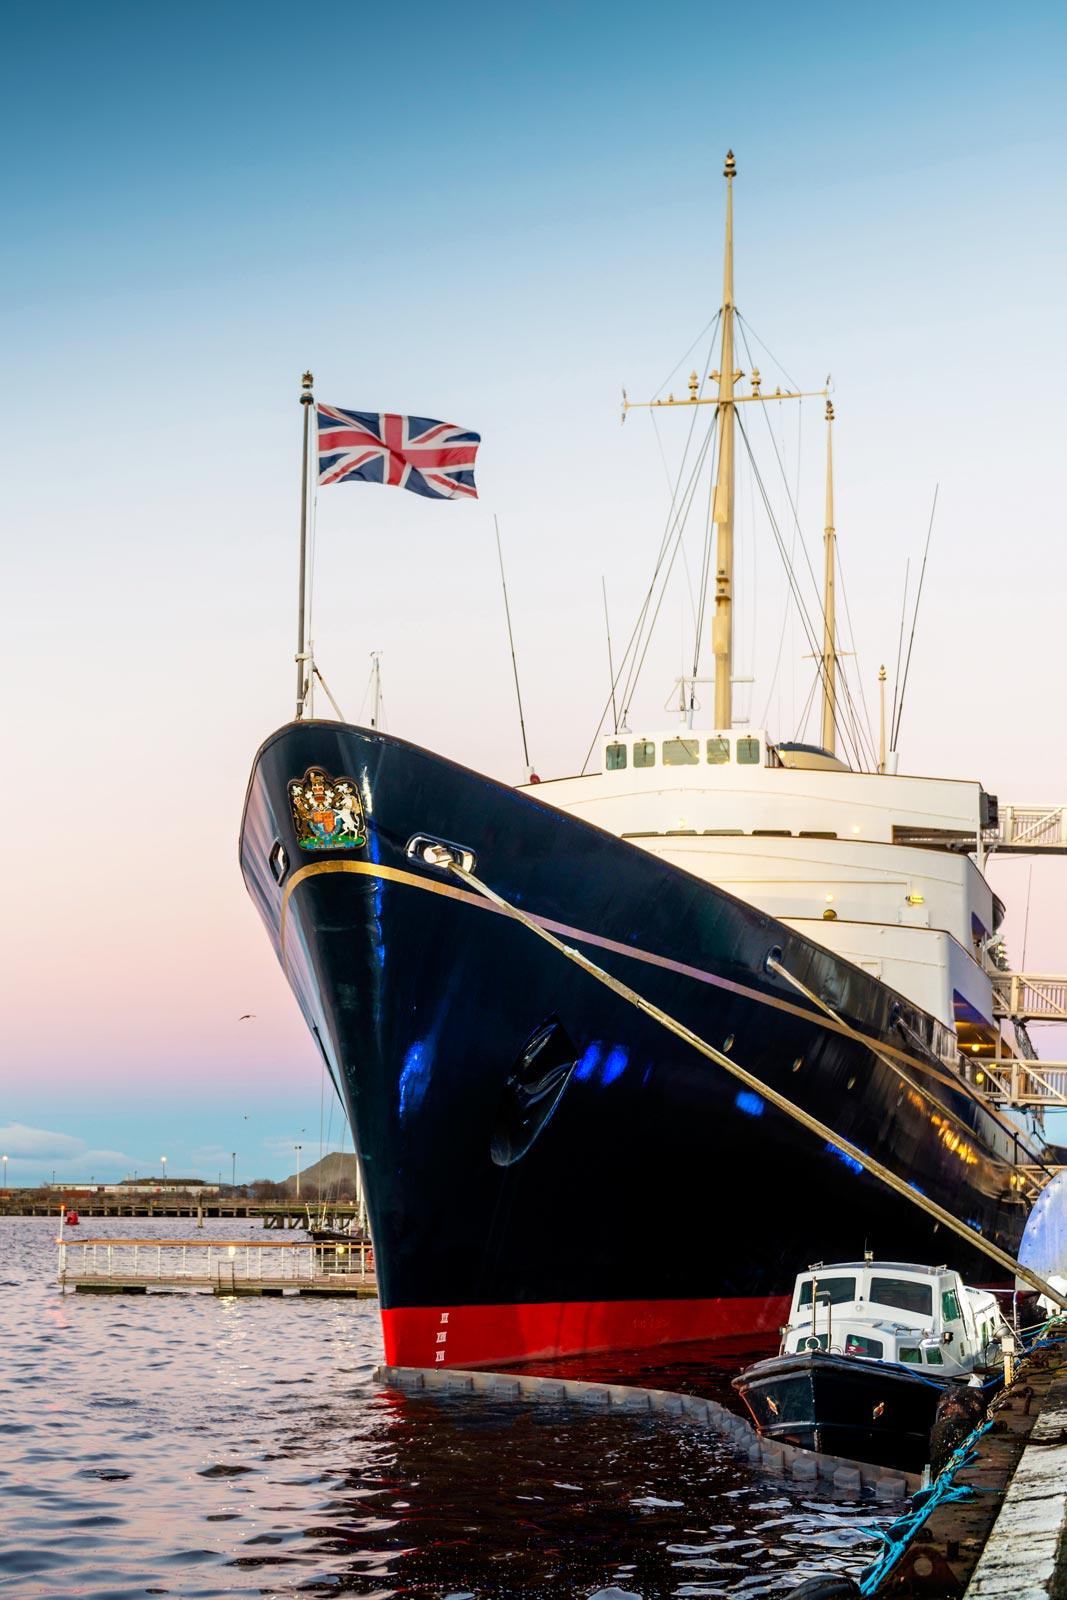 Kilts & Kisses - An Extraordinary Burns Supper on the Royal Yacht Britannia 5